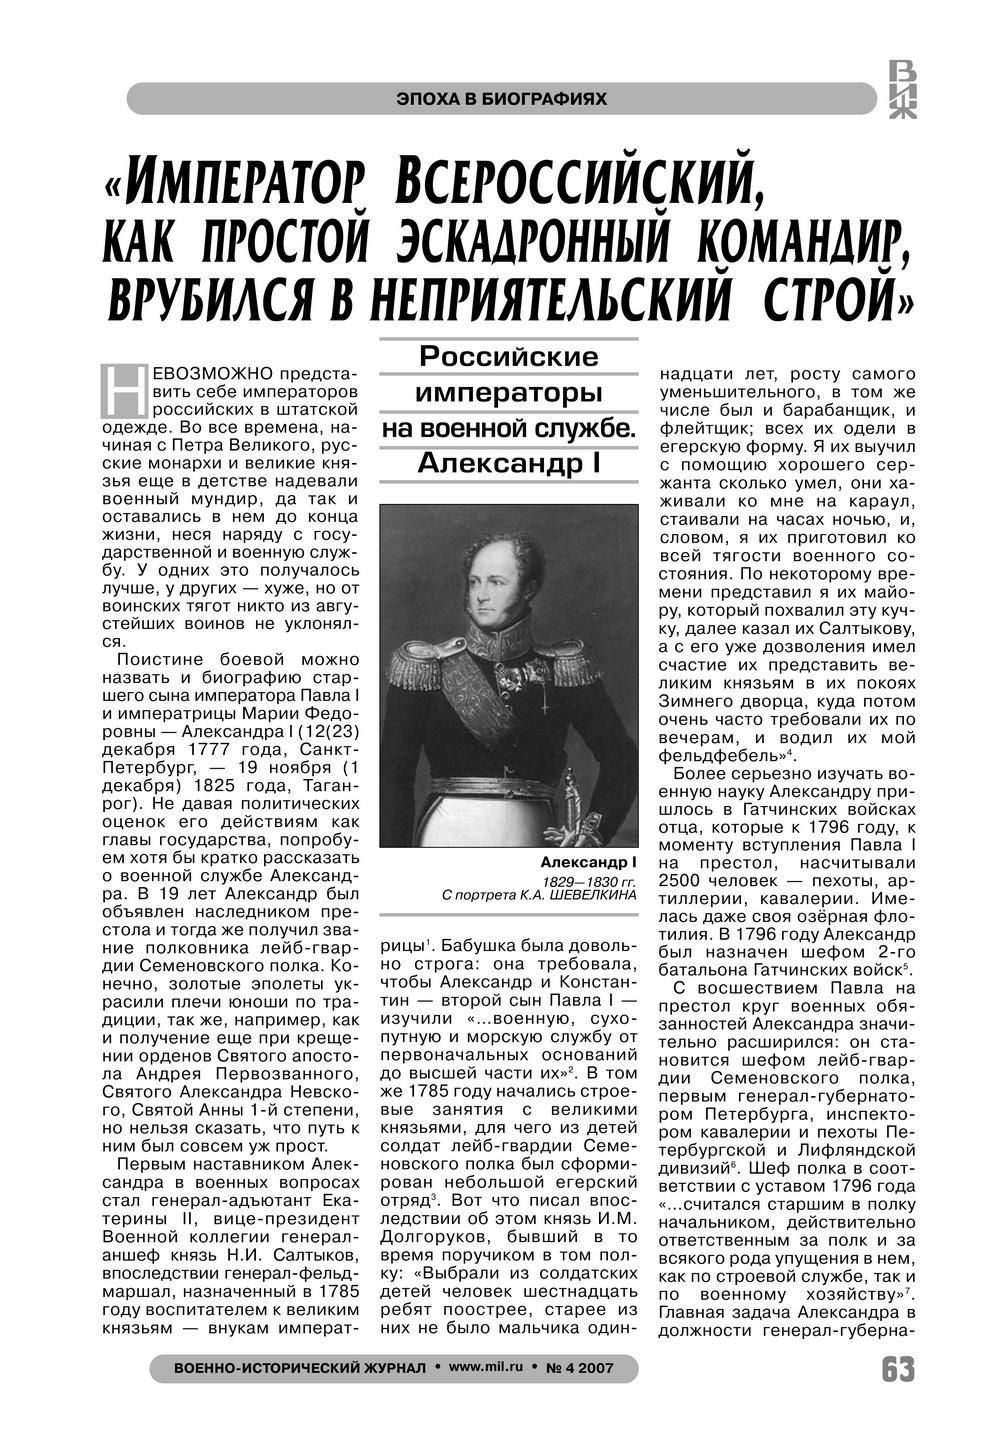 http://images.vfl.ru/ii/1367482302/e96800ad/2262509.jpg